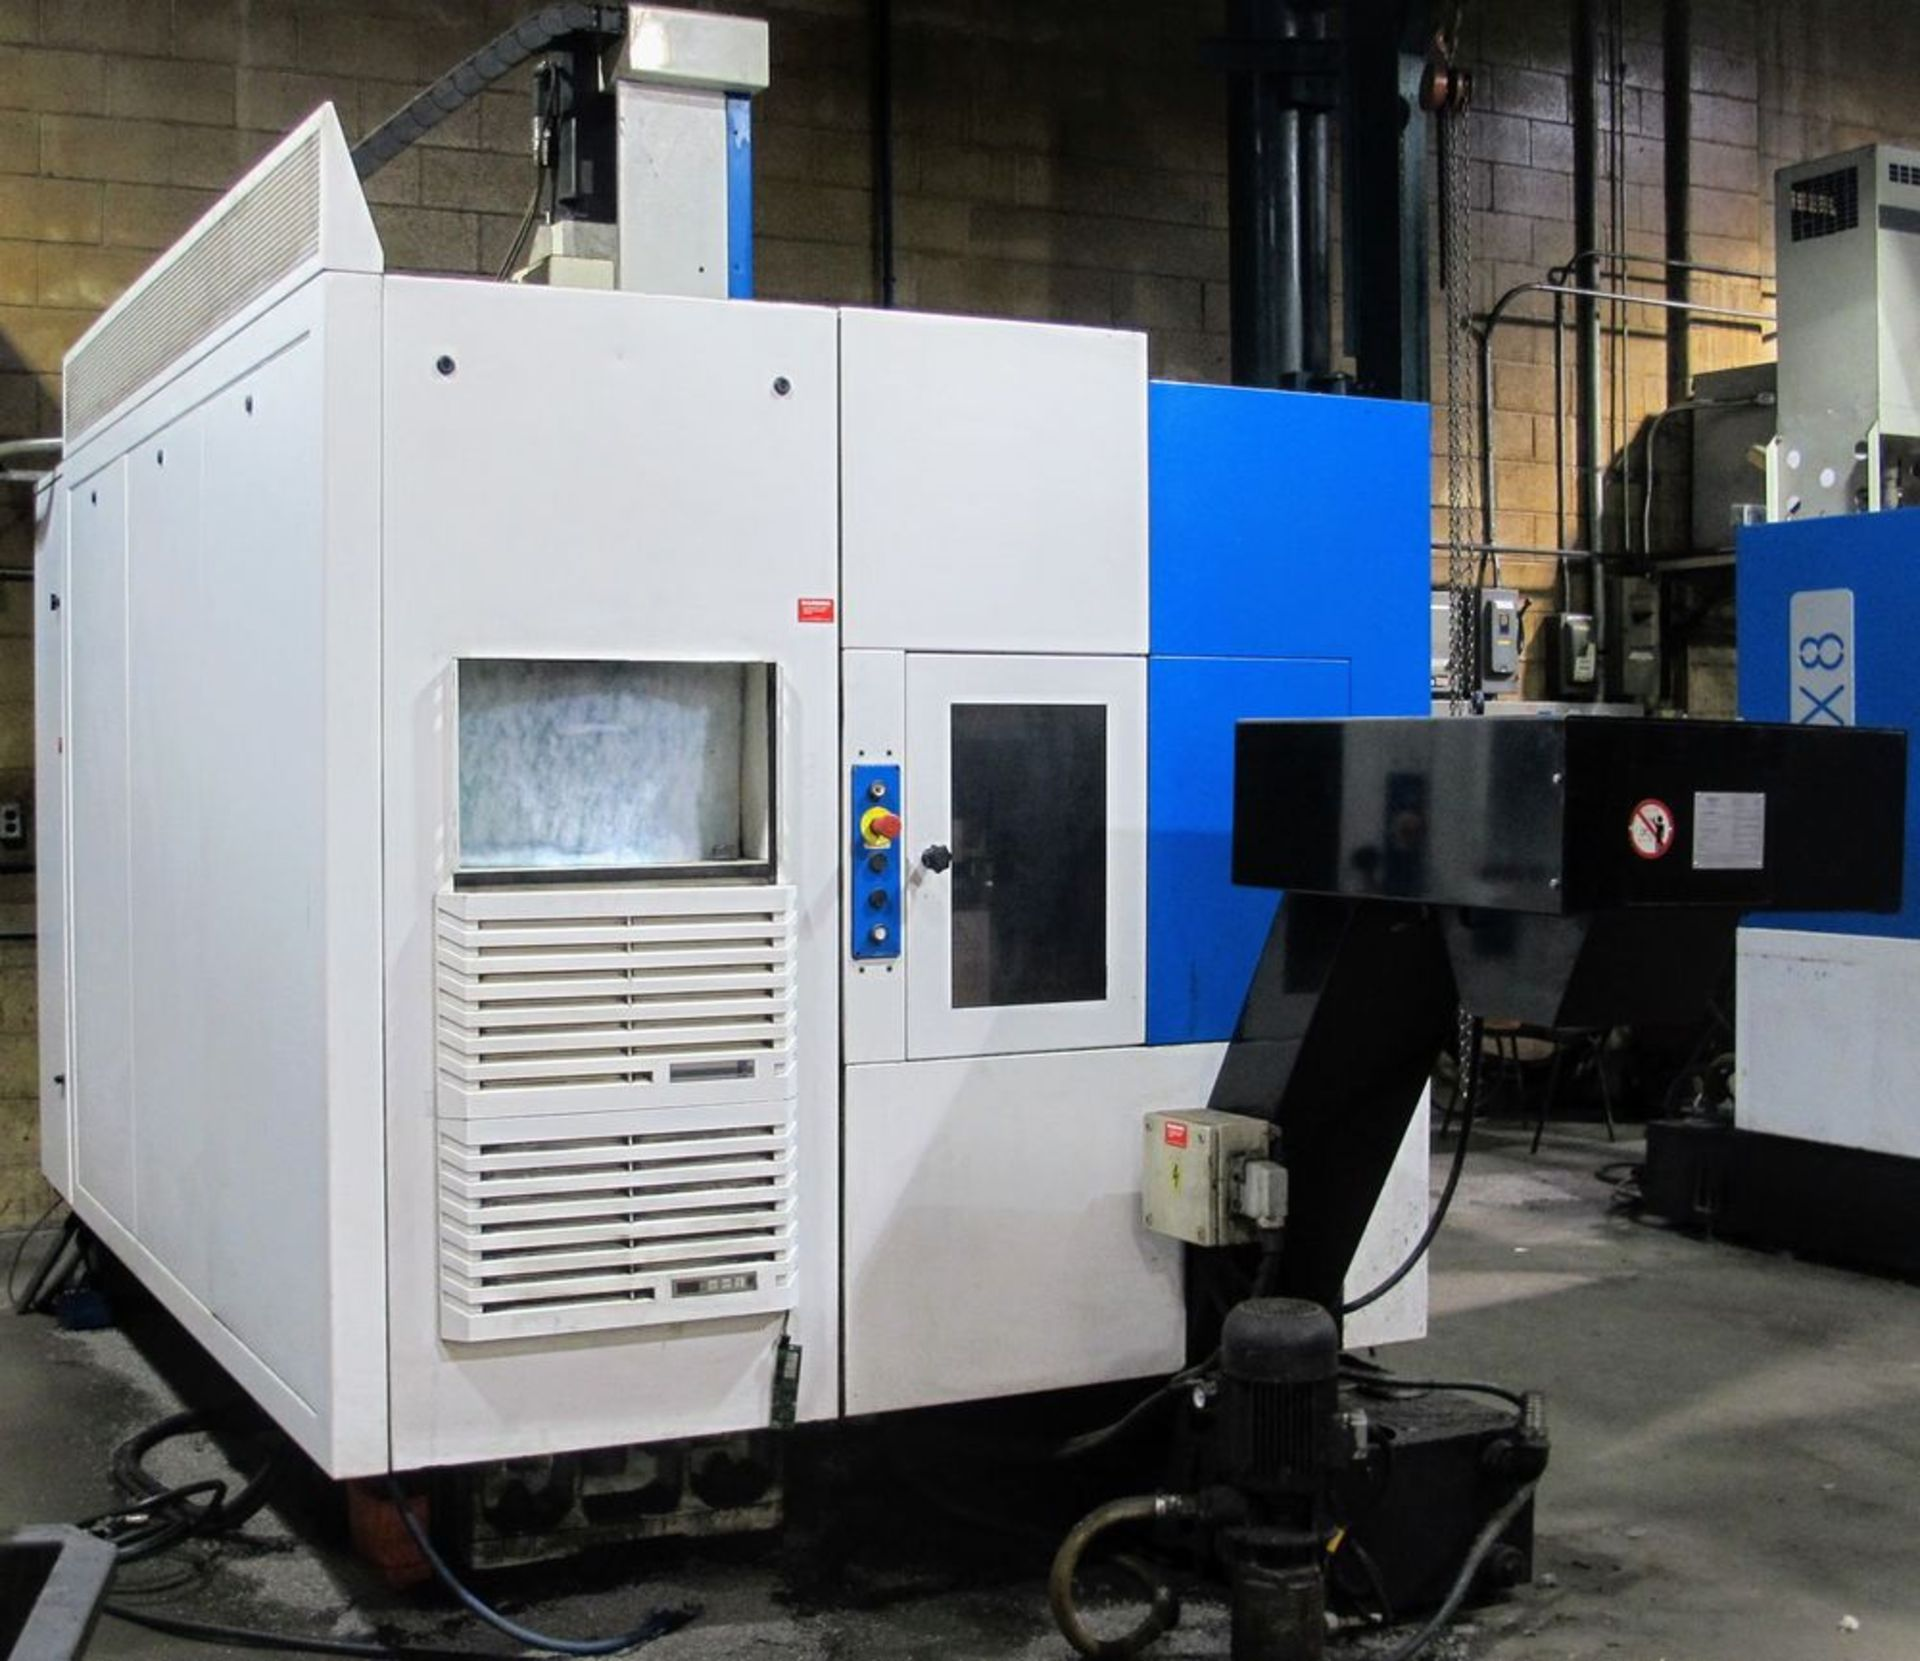 "Lot 16 - 2002 HURON KX8 CNC Vertical Machining Center, s/n 0B1262, 24"" x 32"" Table, Siemens CNC Control,"